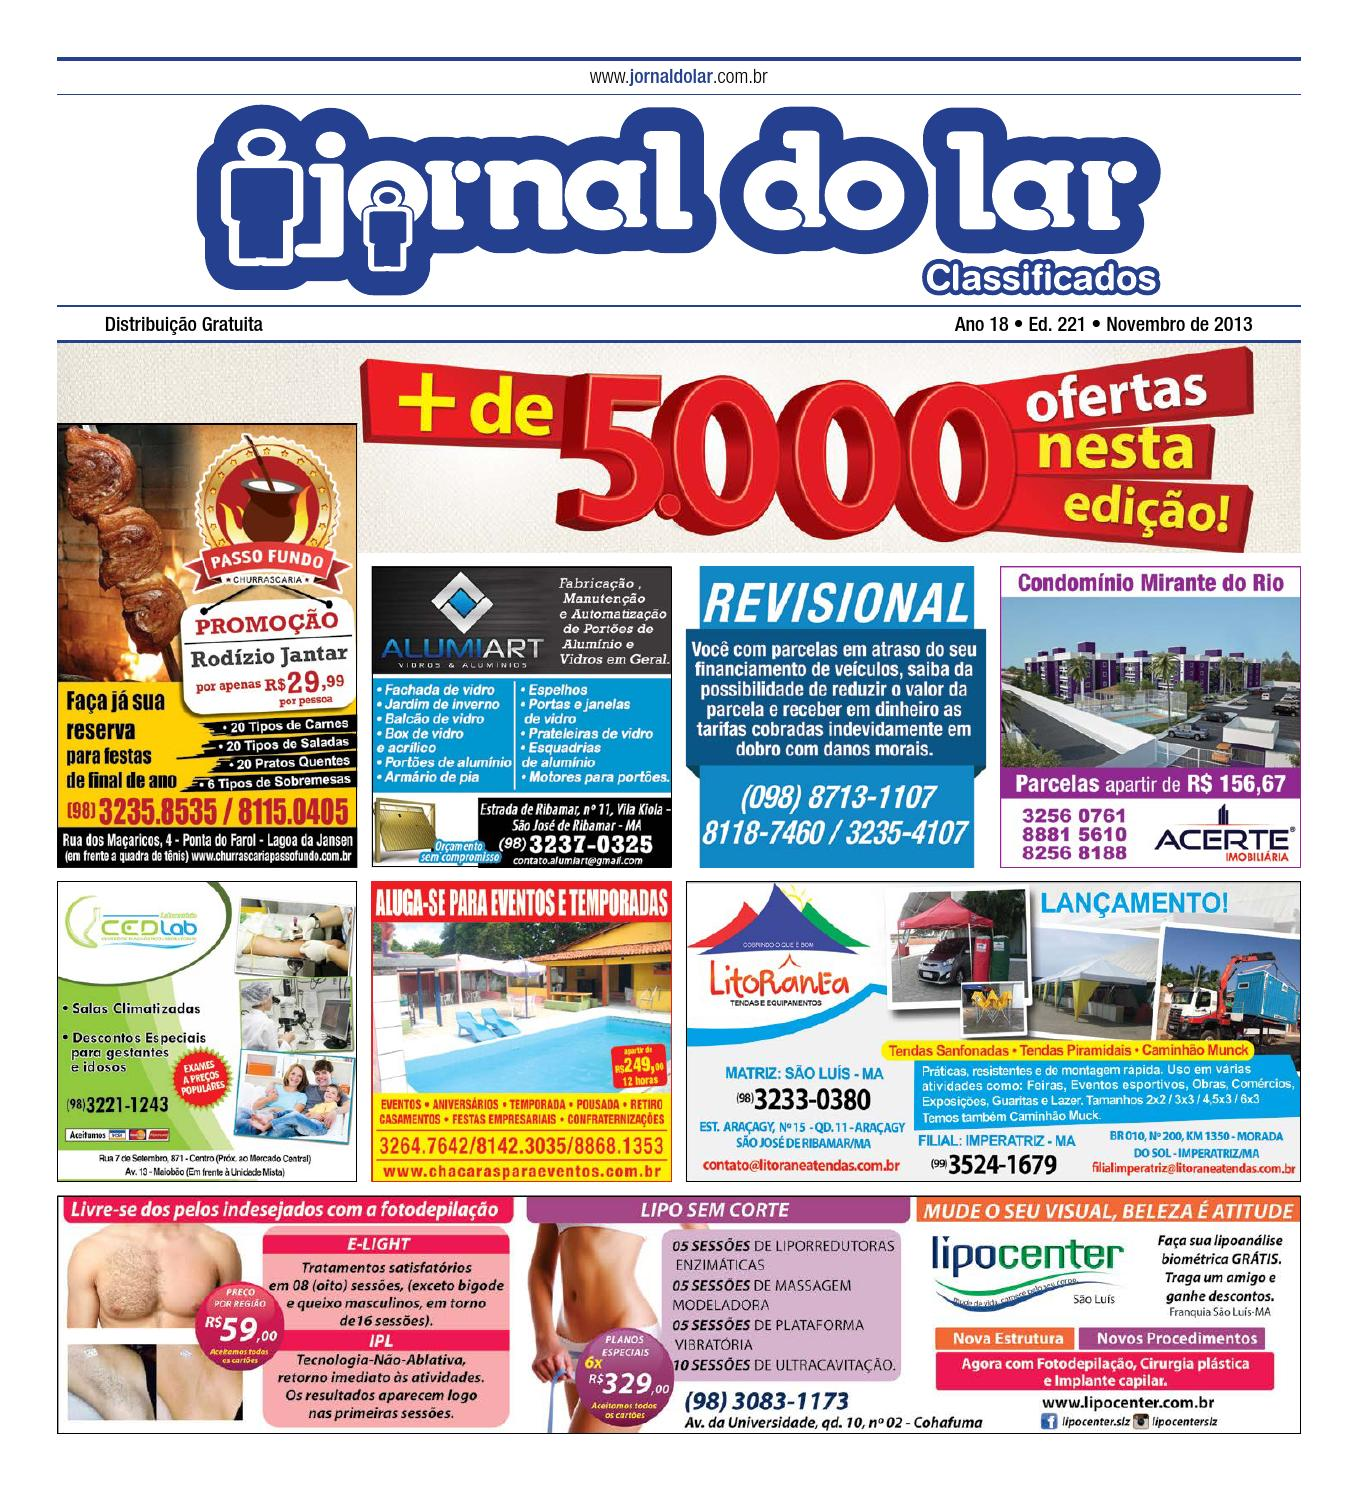 acbf45979 Jornal do Lar Ed. 221 by Jornal do Lar - issuu